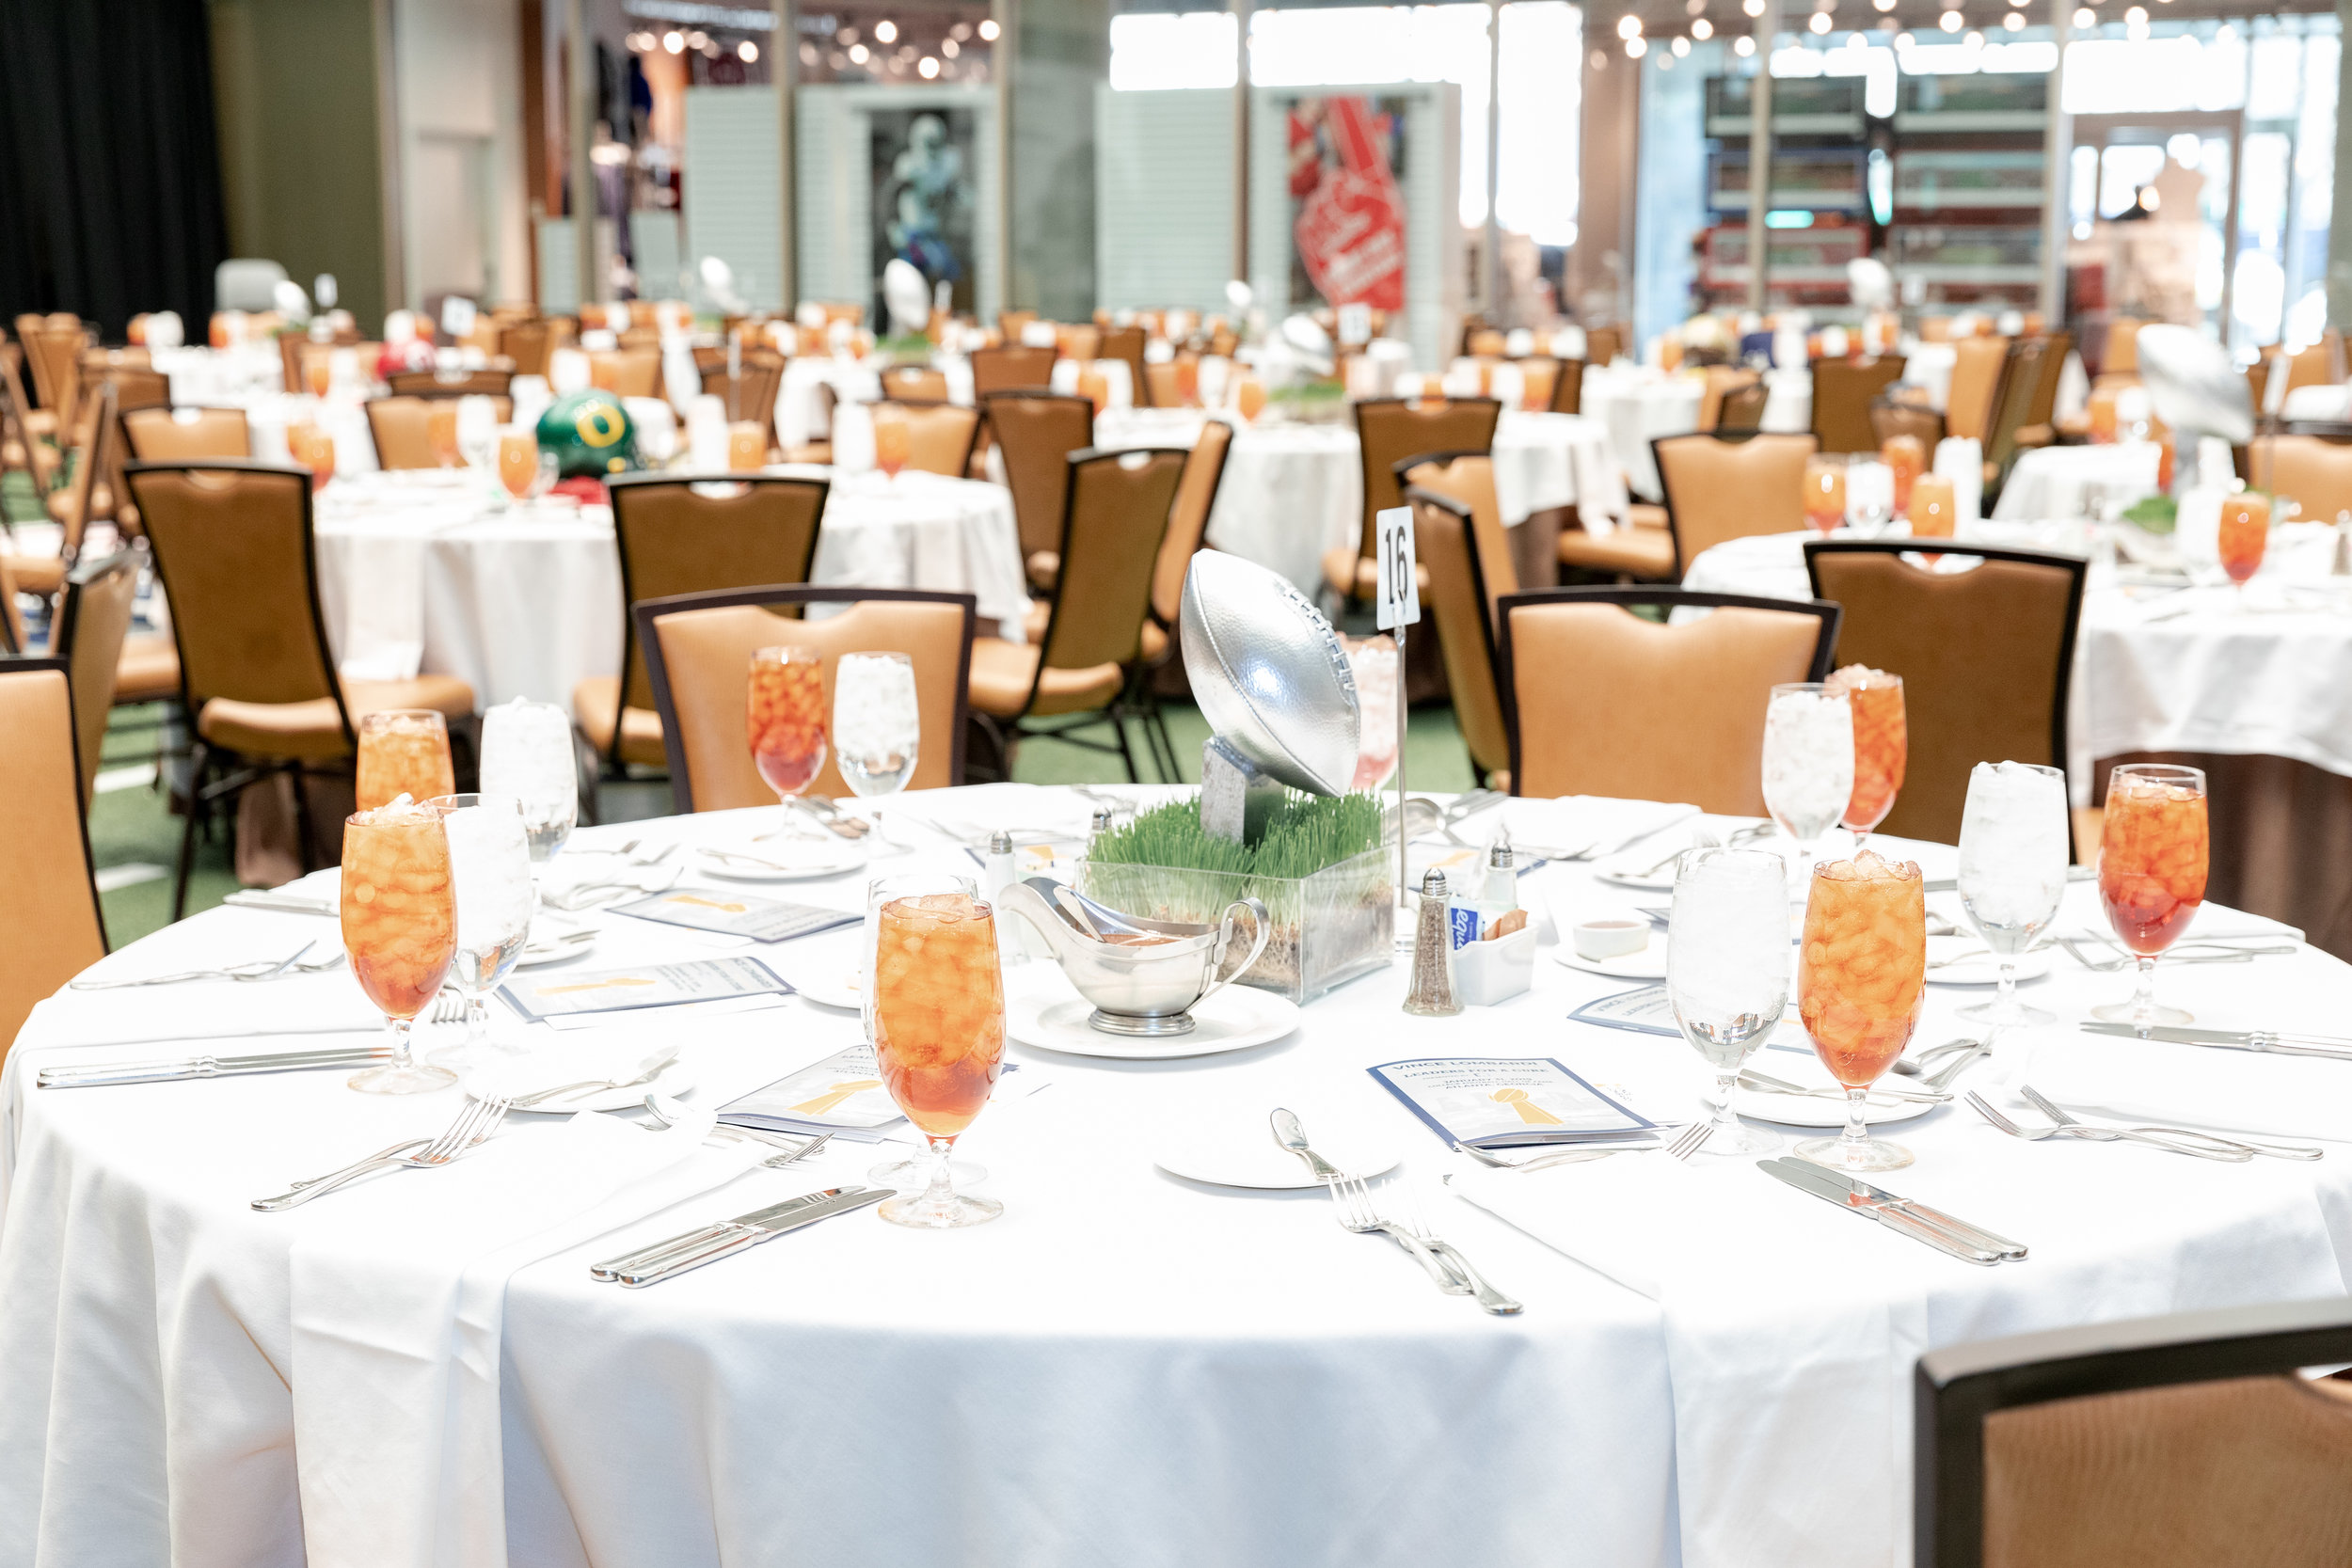 Vince Lombardi Cancer Foundation Event -20190131-0148.jpg